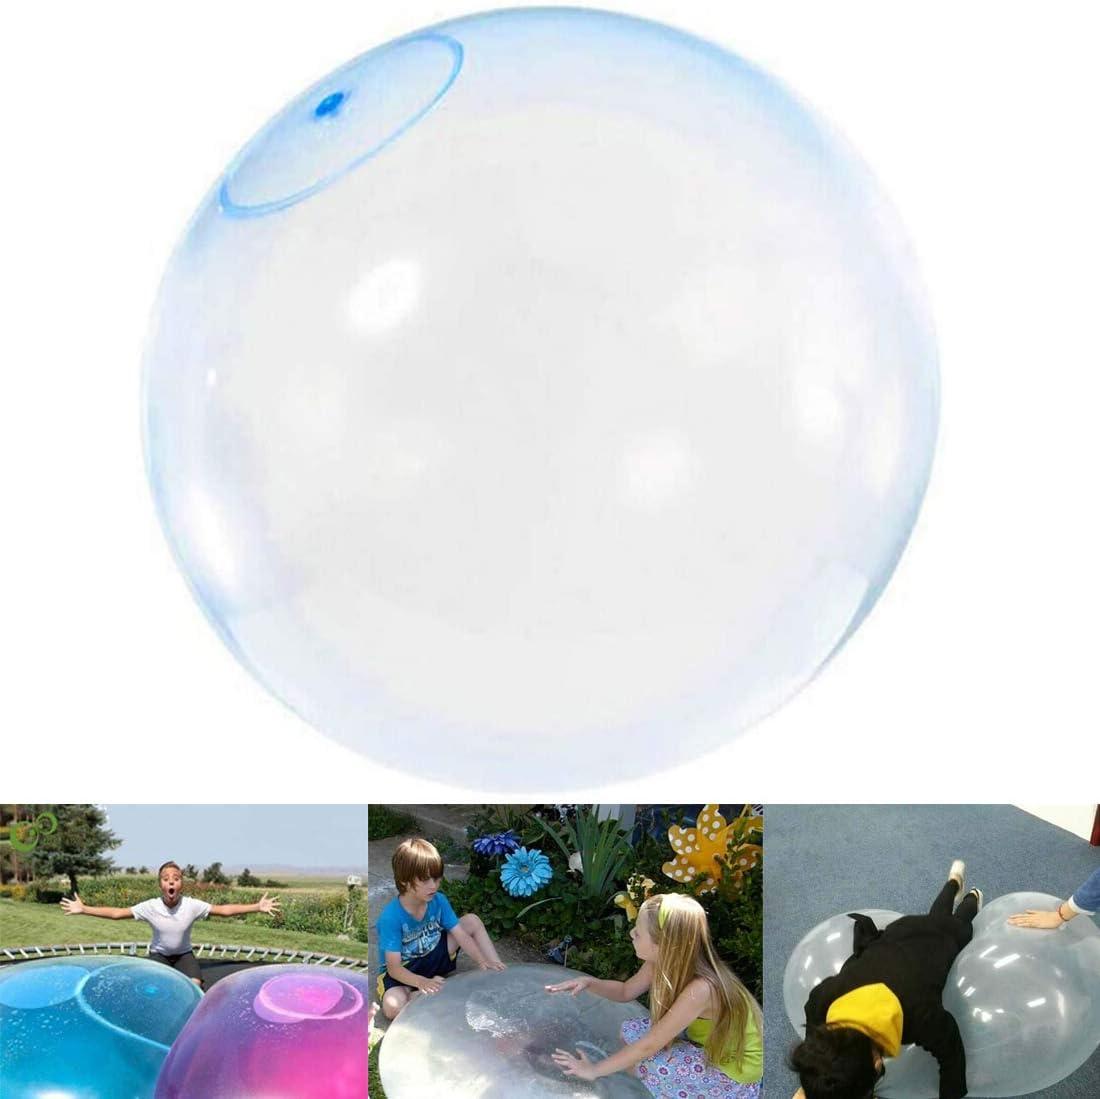 TWWT BubbleWorld Bola de Burbuja Grande de Goma interactiva Llena de Agua, Bola Inflable de Gran tamaño Juguete Infantil Bola Hinchable Bola de Agua de inyección Bola de Burbuja (Azul)